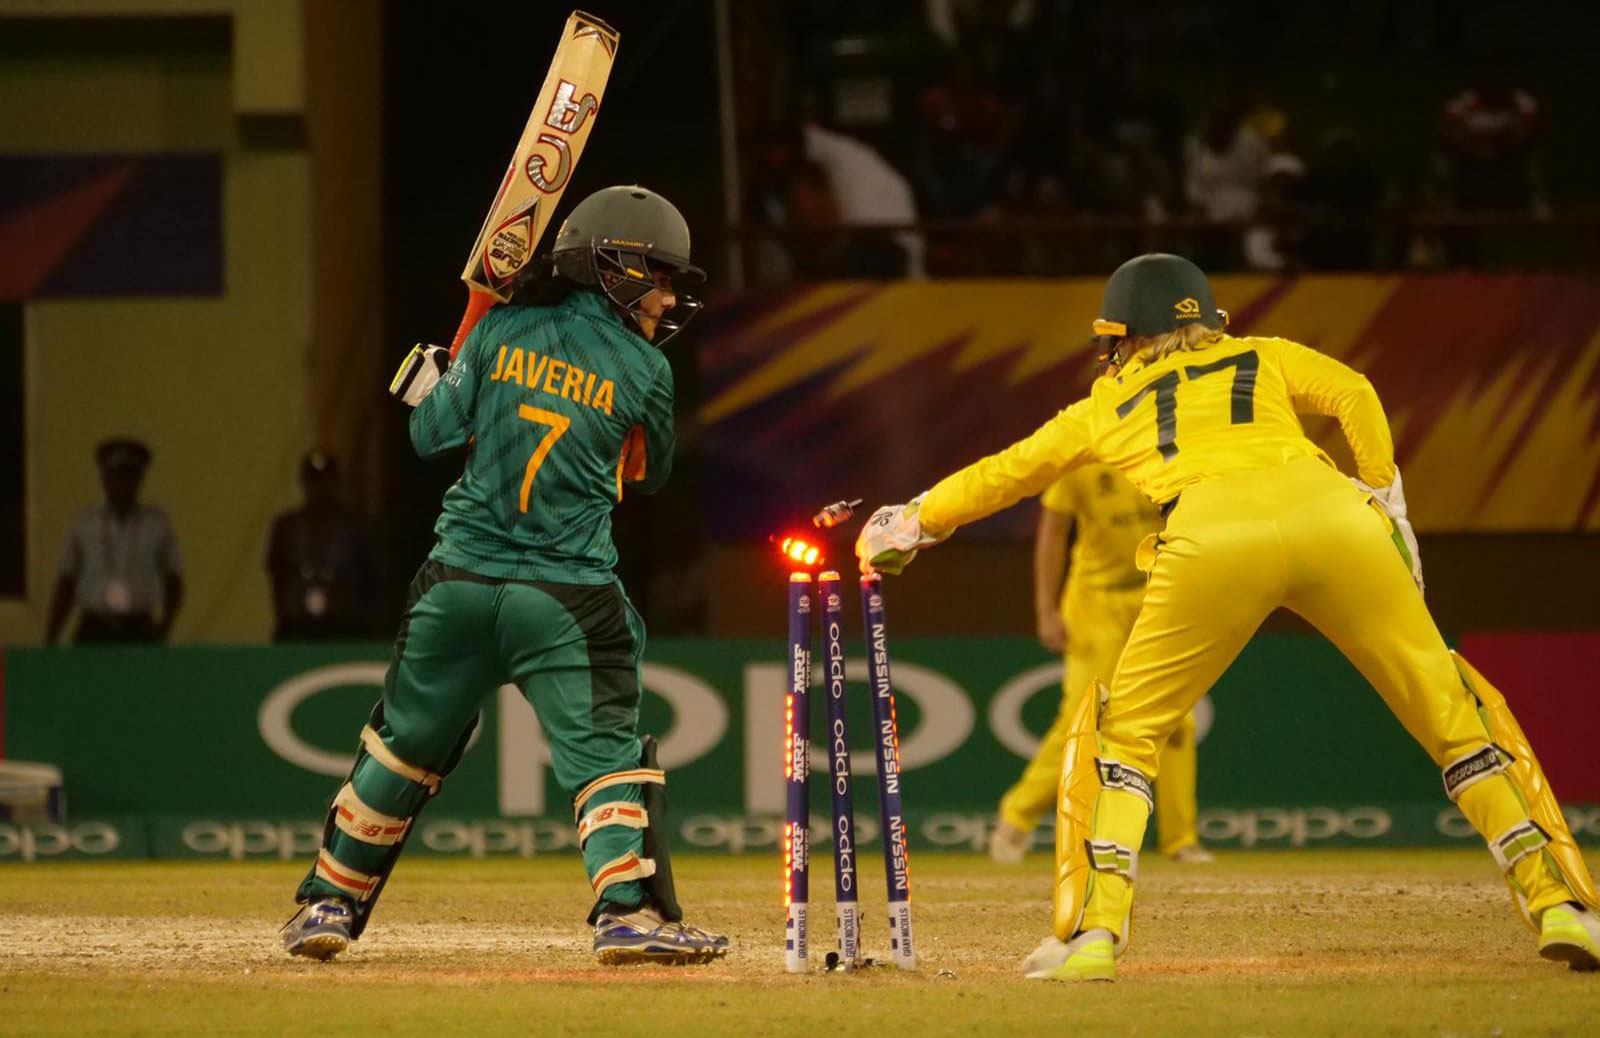 Alyssa Healy in fine form behind the stumps // Cricket Network